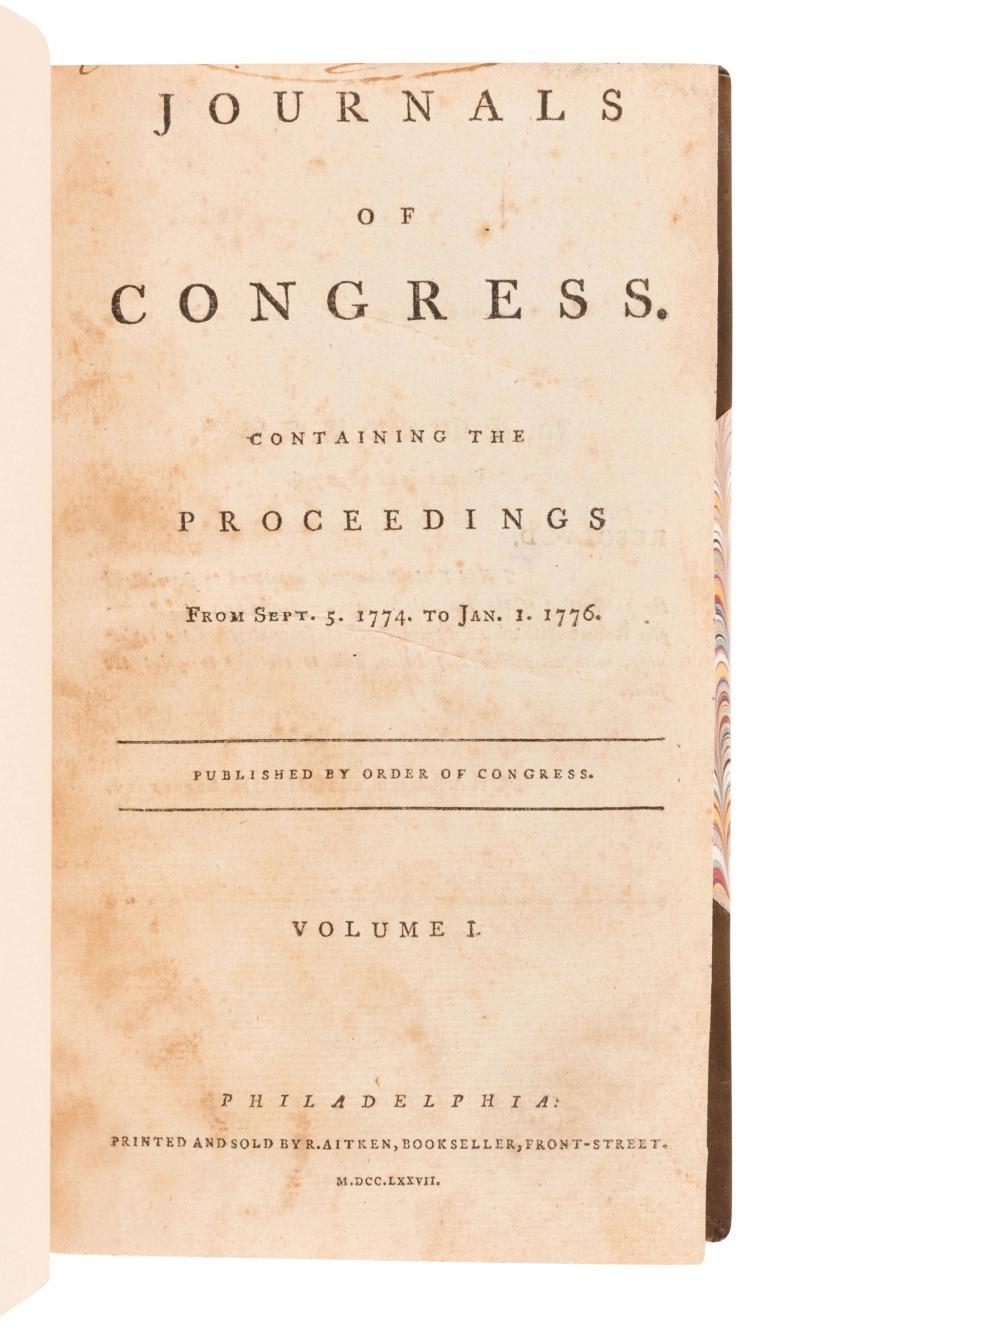 [UNITED STATES CONTINENTAL CONGRESS]. Journals of the Congress...Volume I (Sept. 5, 1774-Jan. 1, 1776) through Volume XIII (November 1787-November 1788). Philadelphia and New York: R. Aitken, John Dunlap, John Patterson, David Claypoole, 1777-1788.